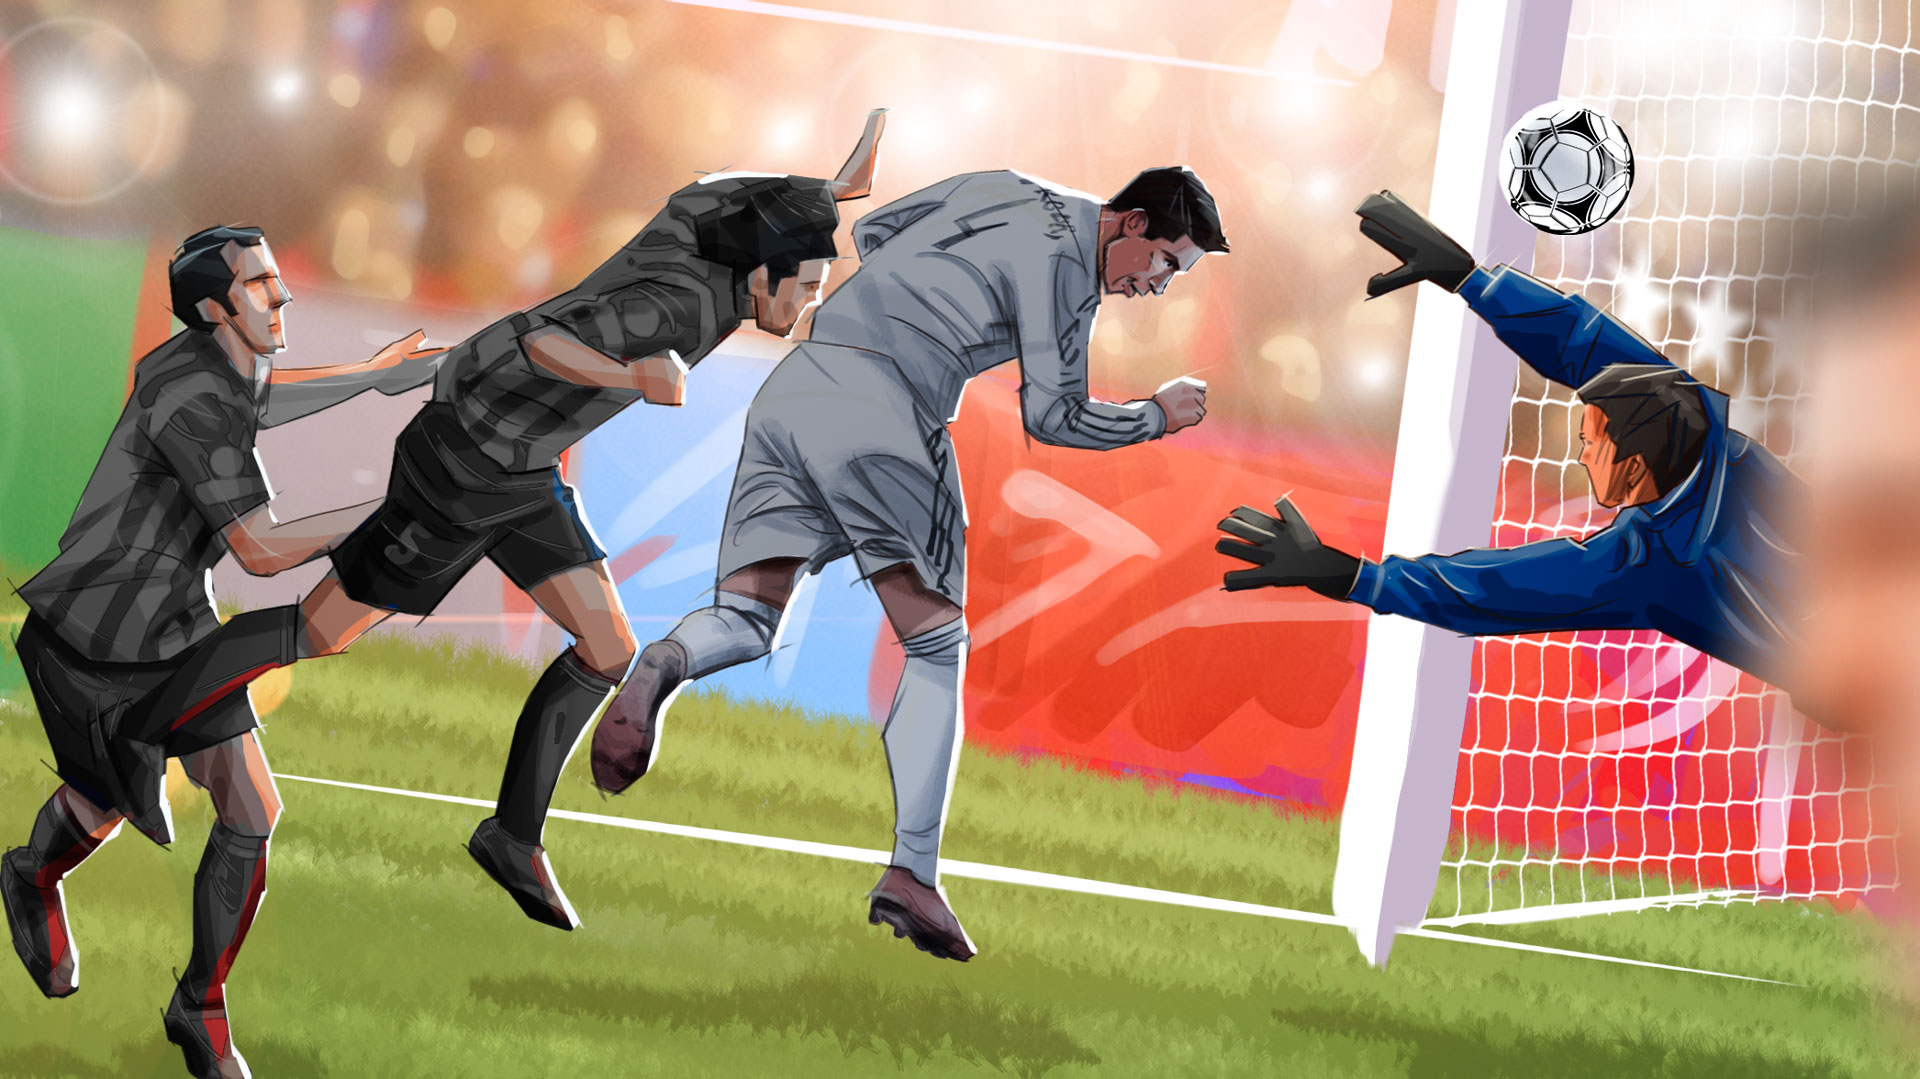 soccer goal illustration, 'Famous matches - illustrations for web game